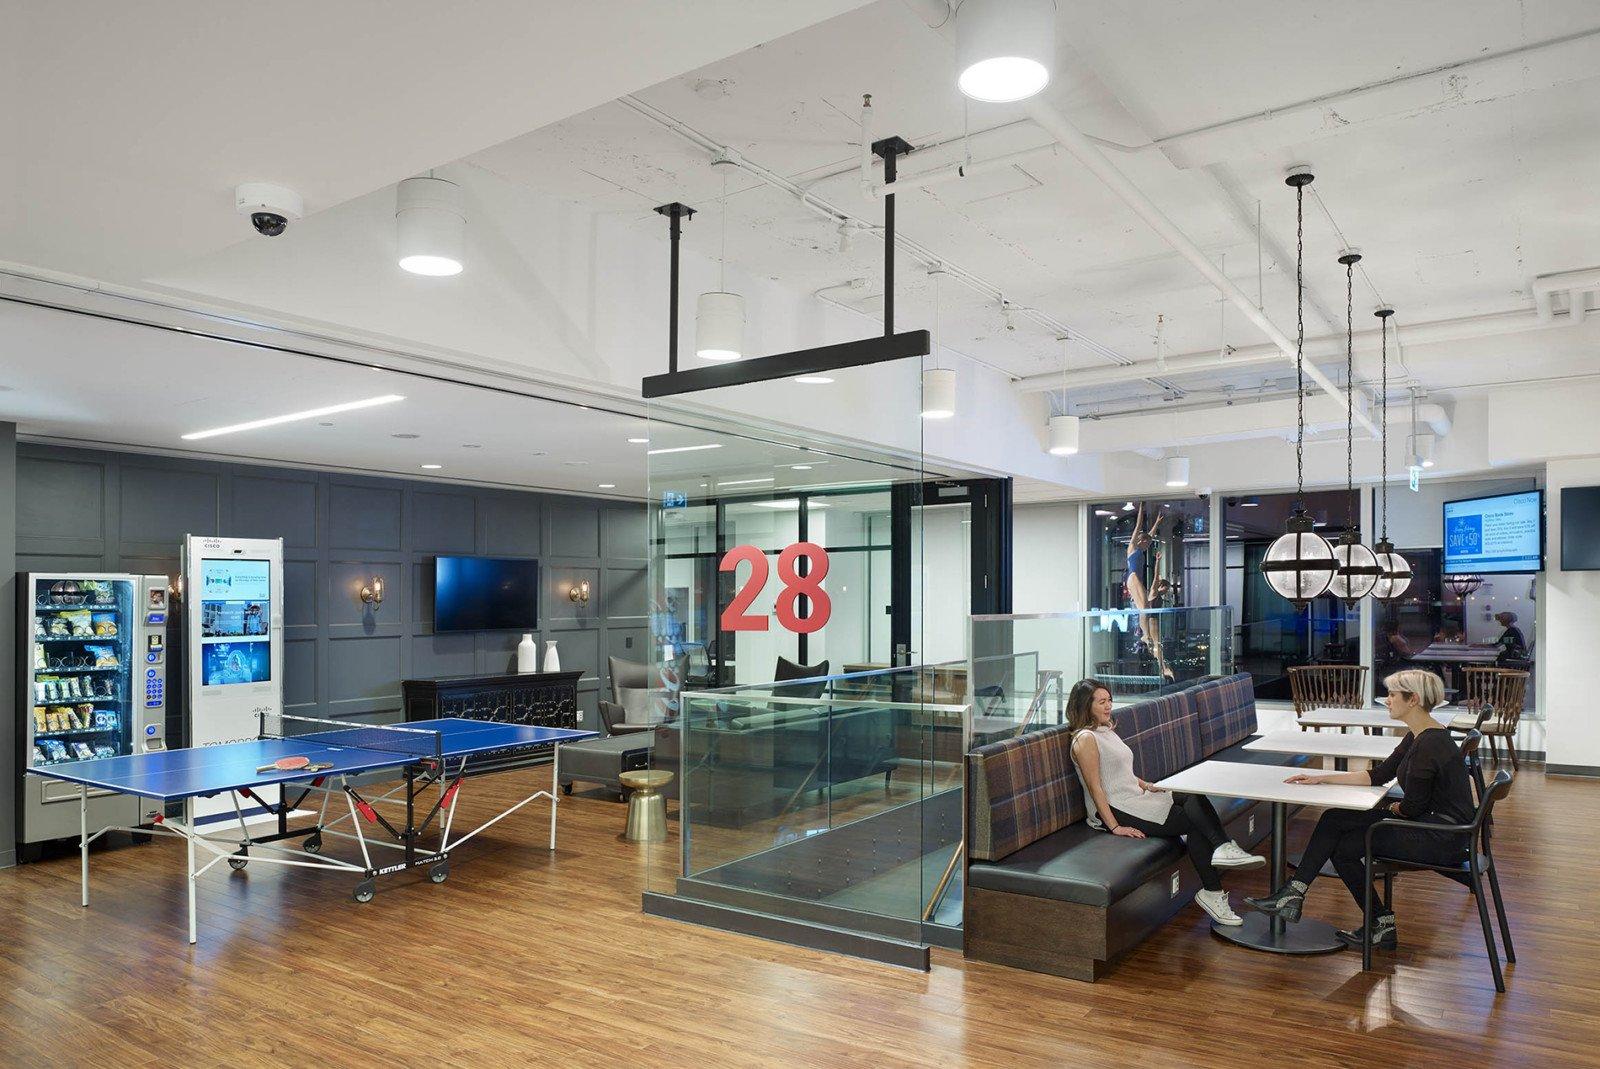 Cisco-Systems-Canada-Headquarters-Break-Area-1900-1600x1069.jpg